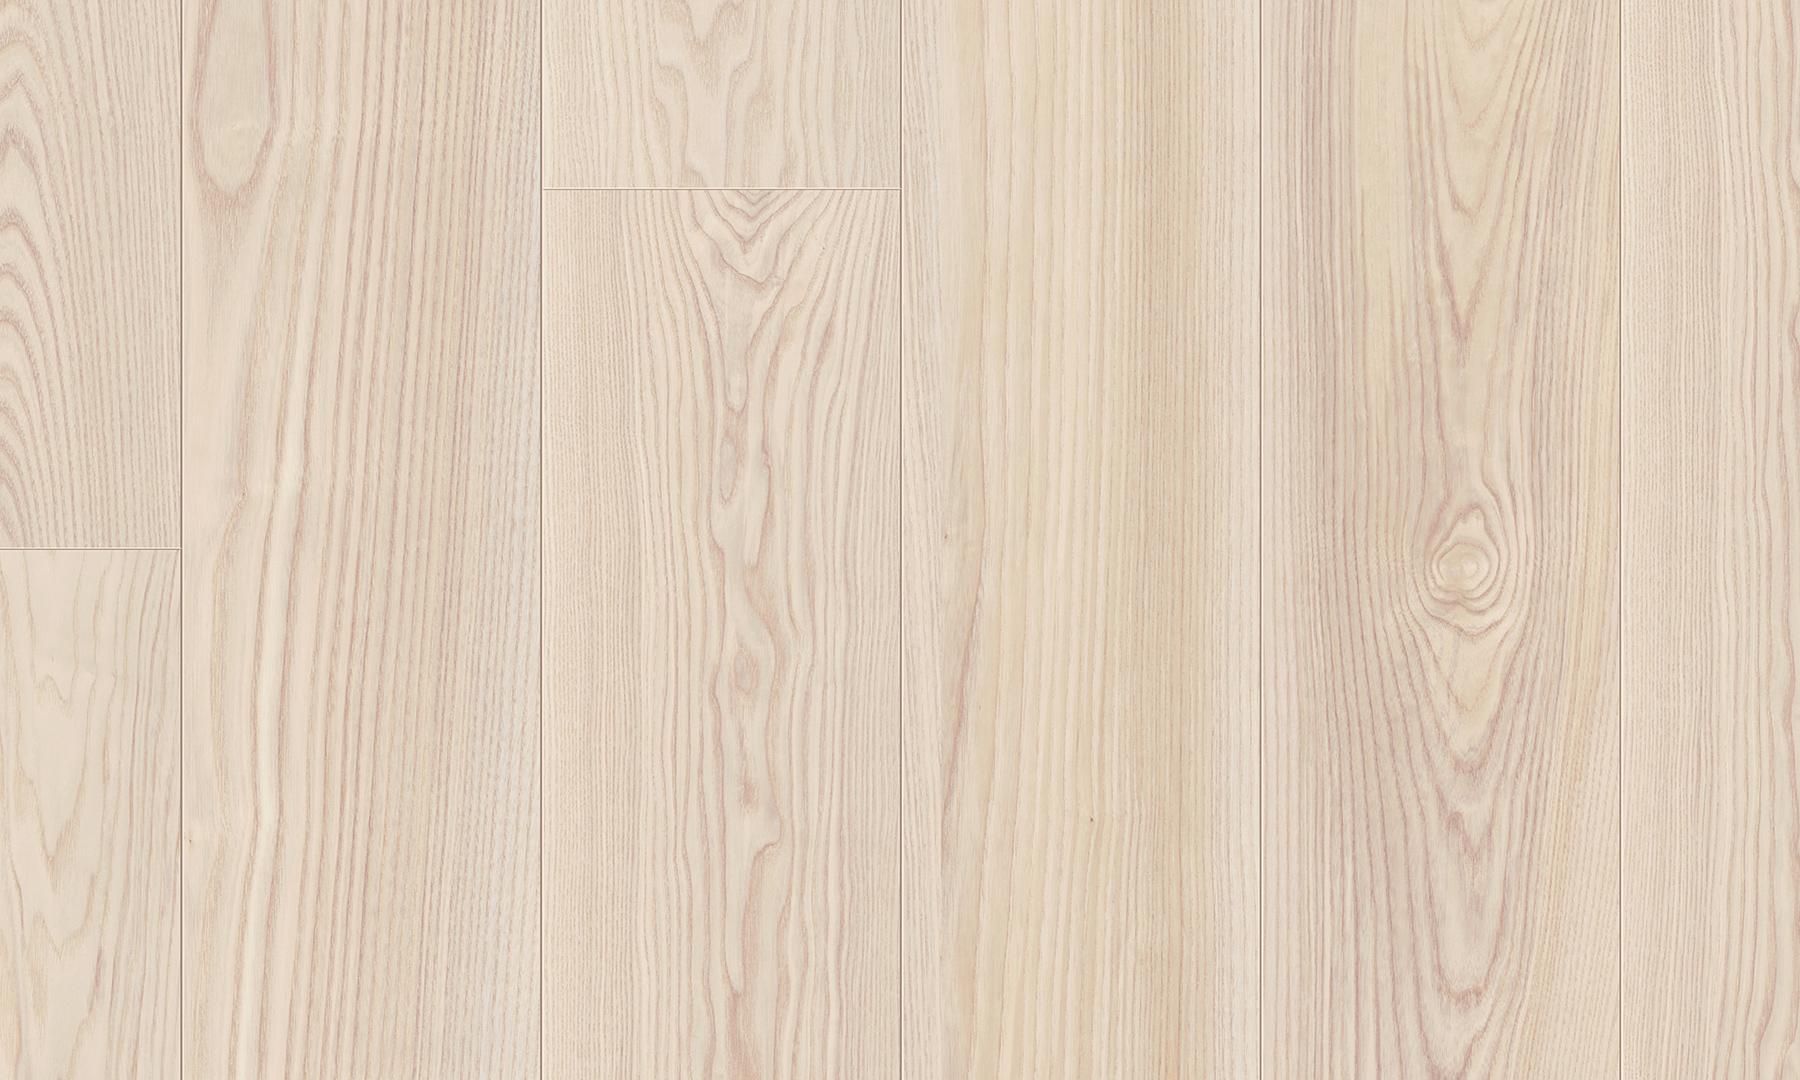 Hard wood flooring in mirage red oak charcoal for 100 floors floor 23